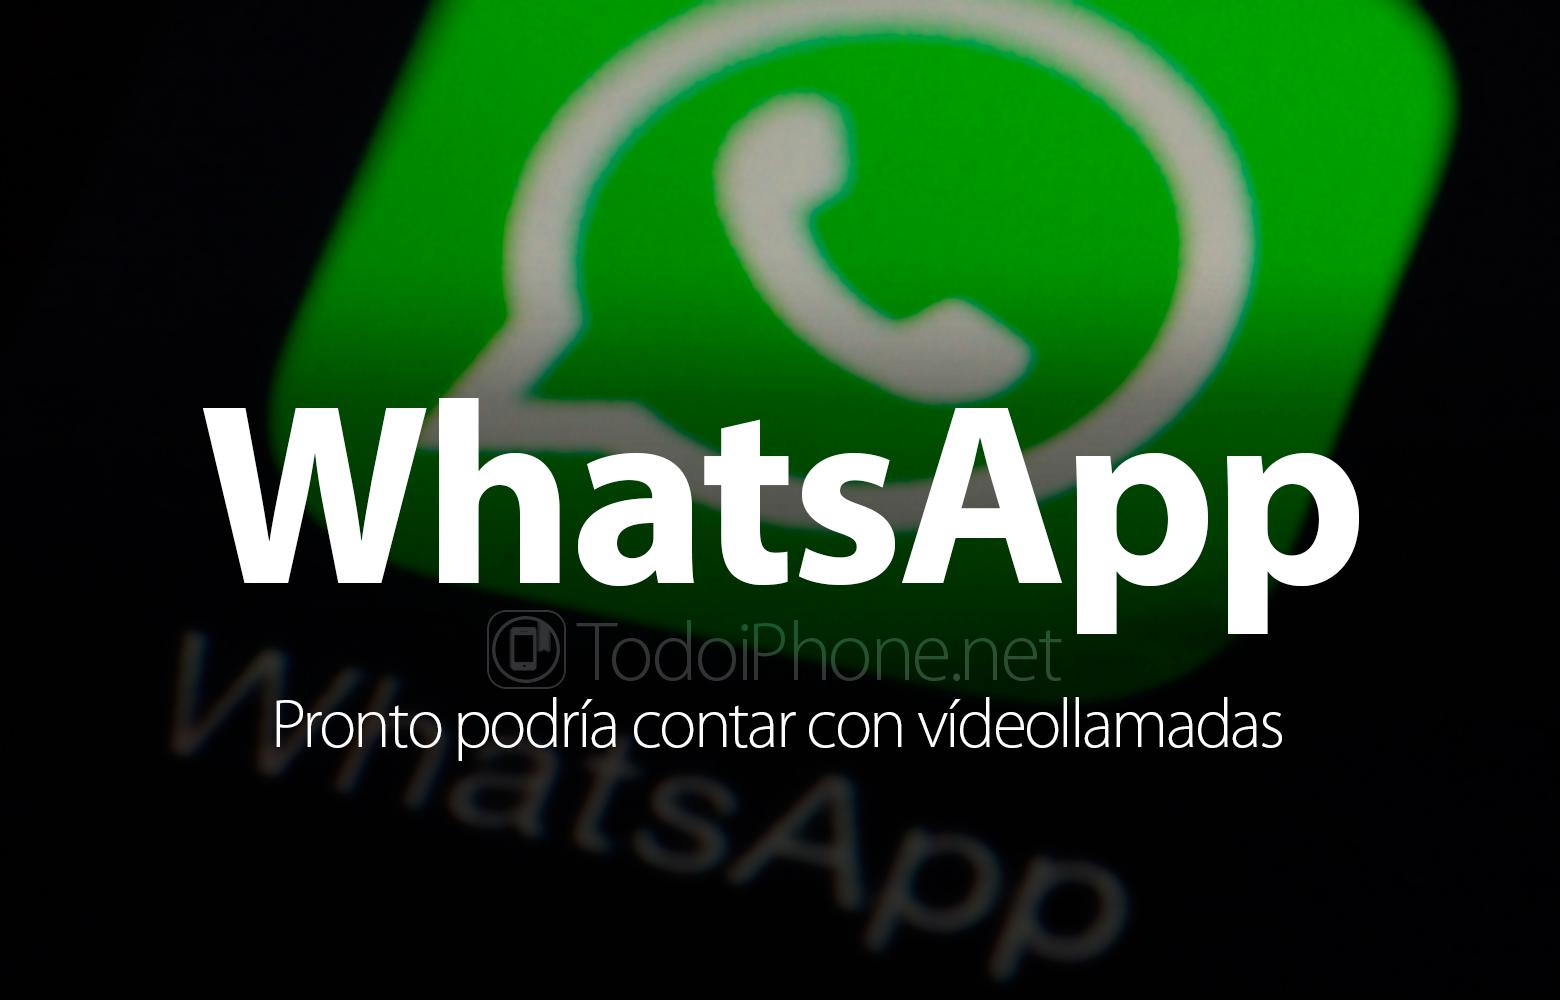 WhatsApp dapat segera melakukan panggilan video 1